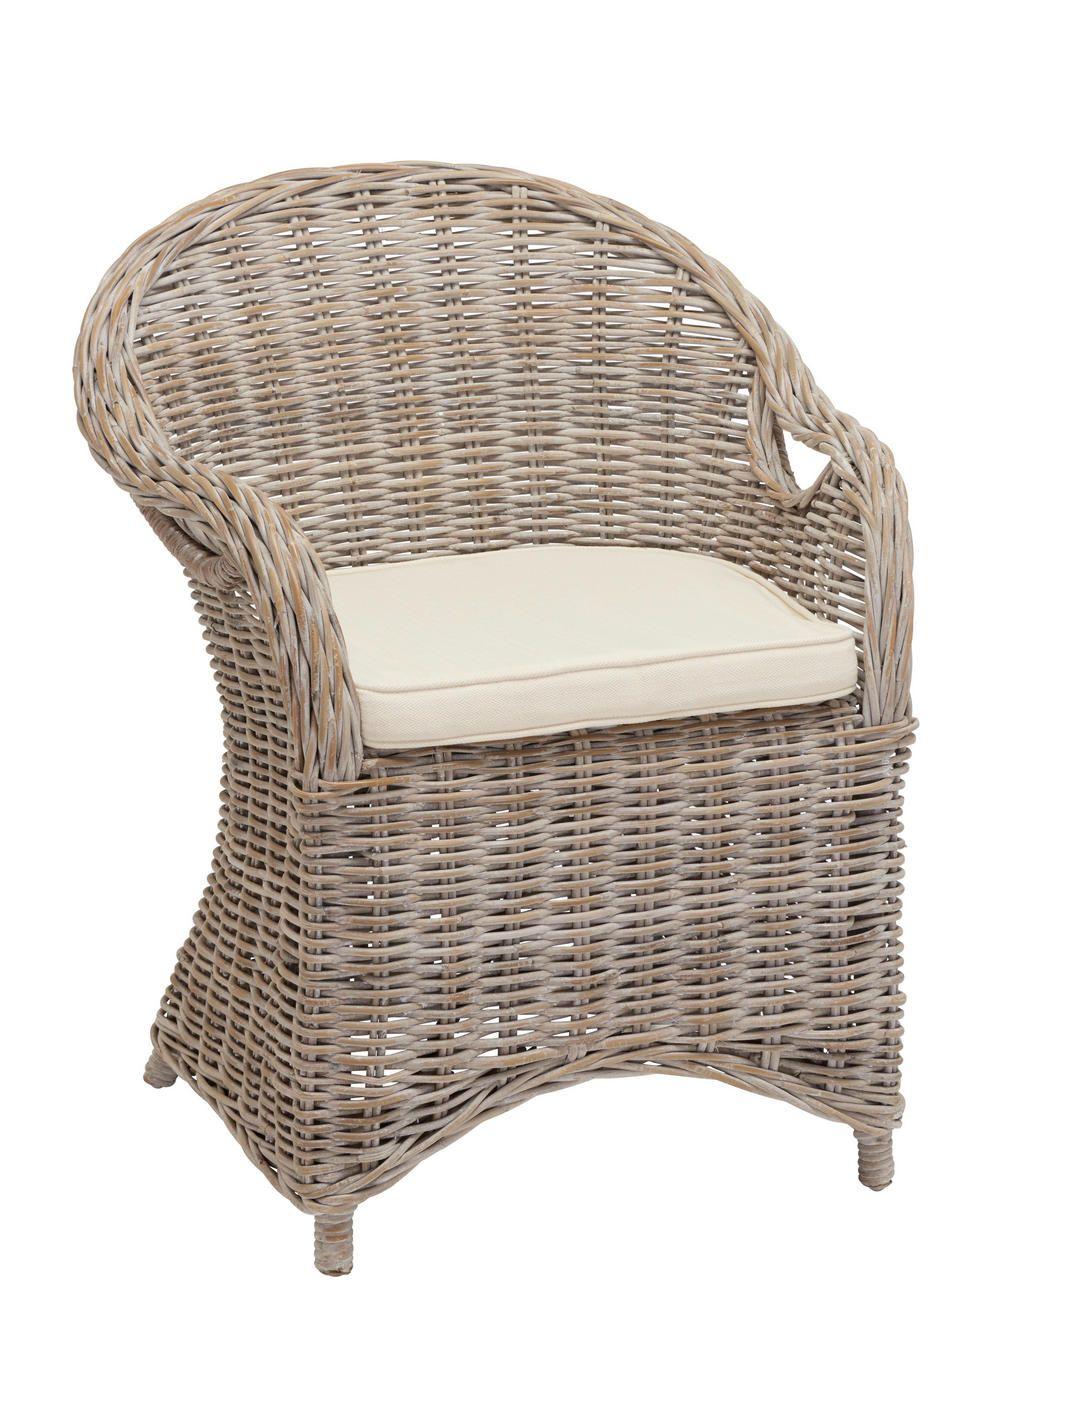 Stuhl Online Kaufen Xxxlutz Korbstuhle Polyrattan Sessel Sessel